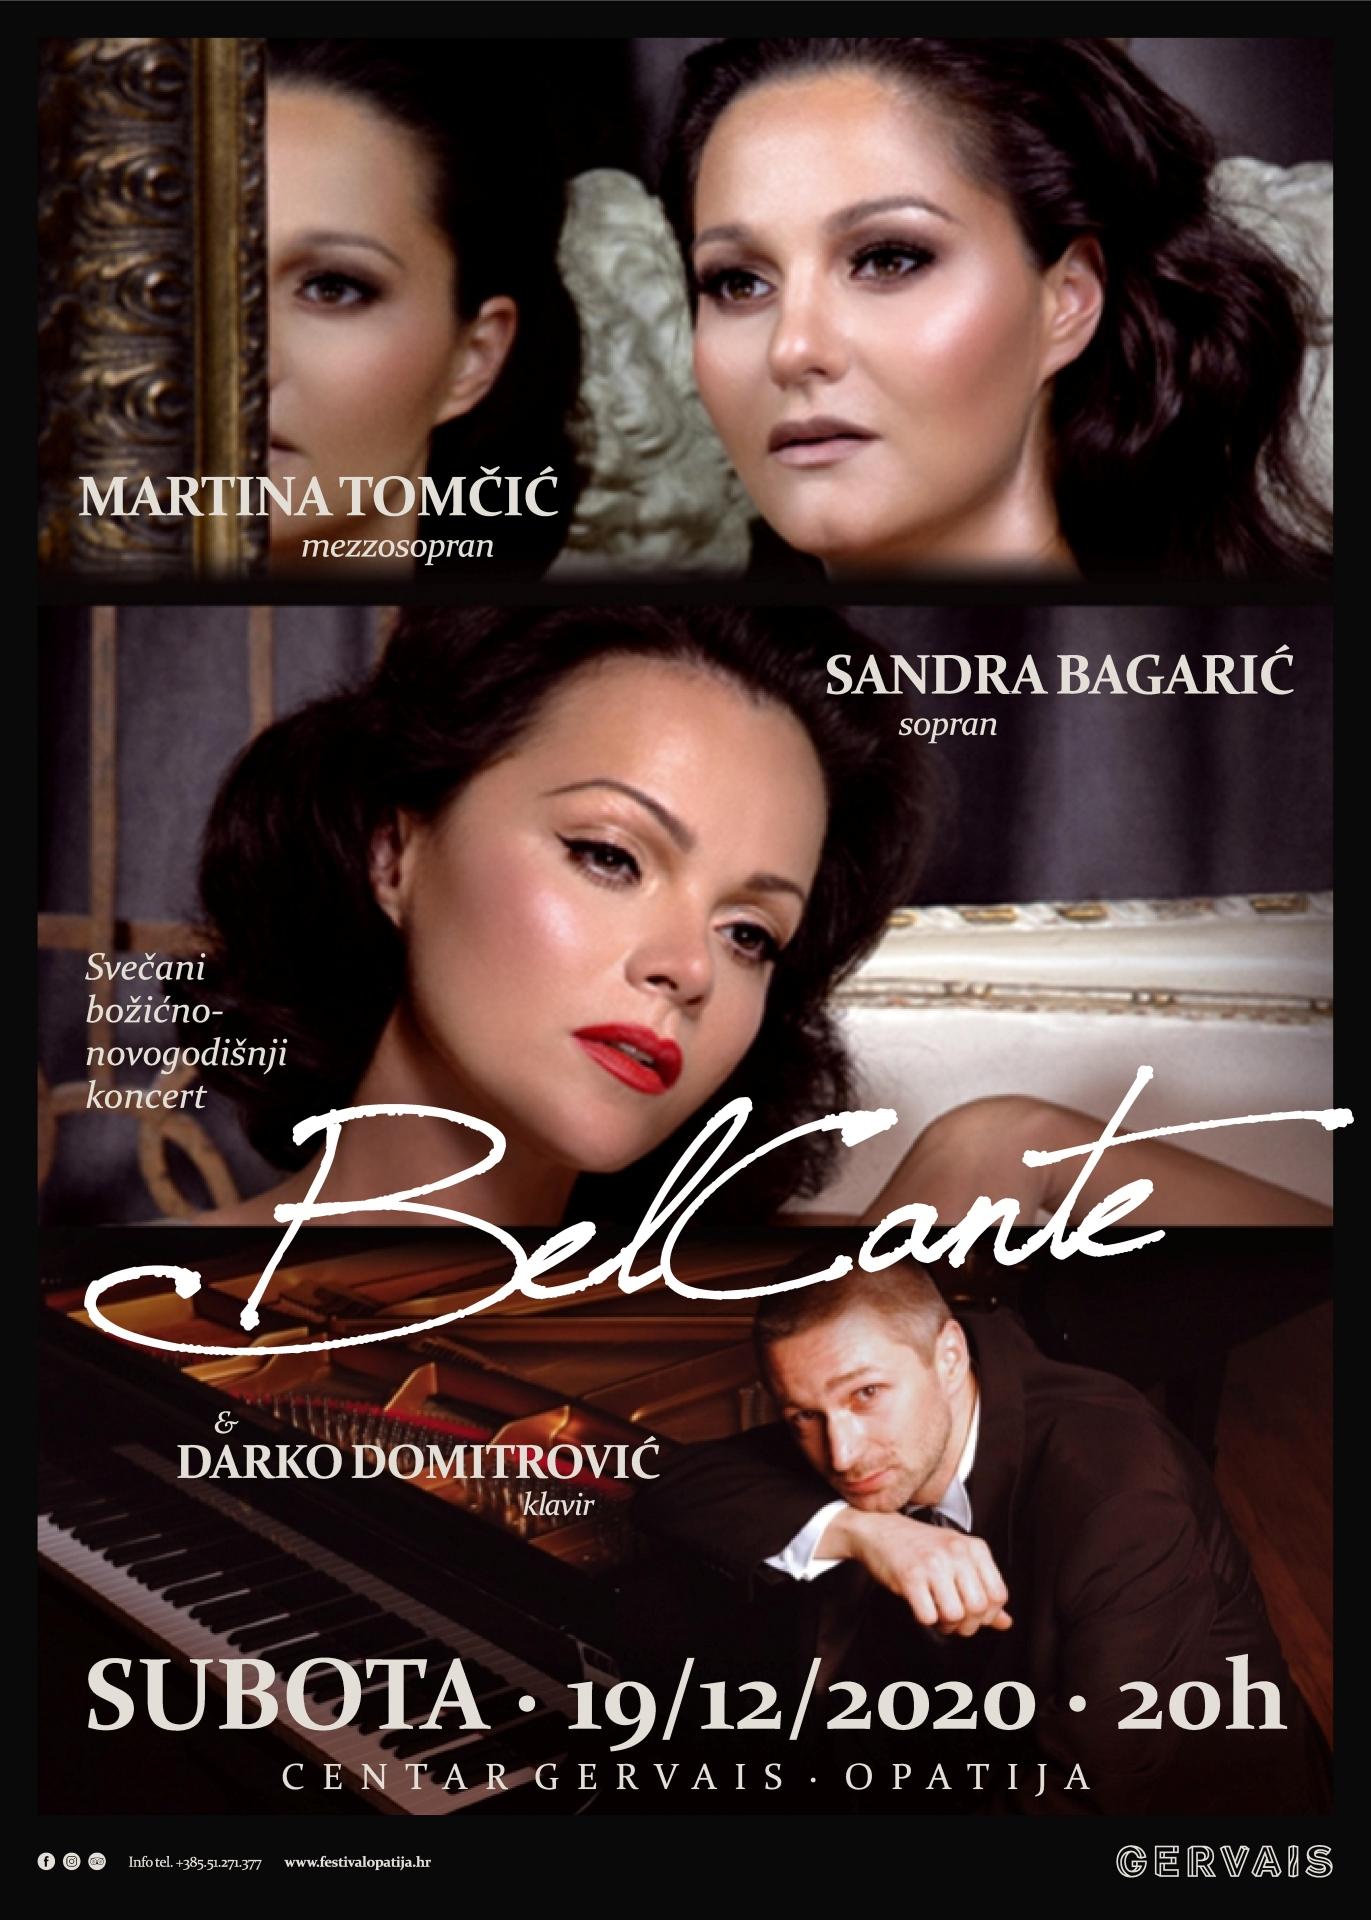 Belcante Sandra Bagarić i Martina Tomčić (2)